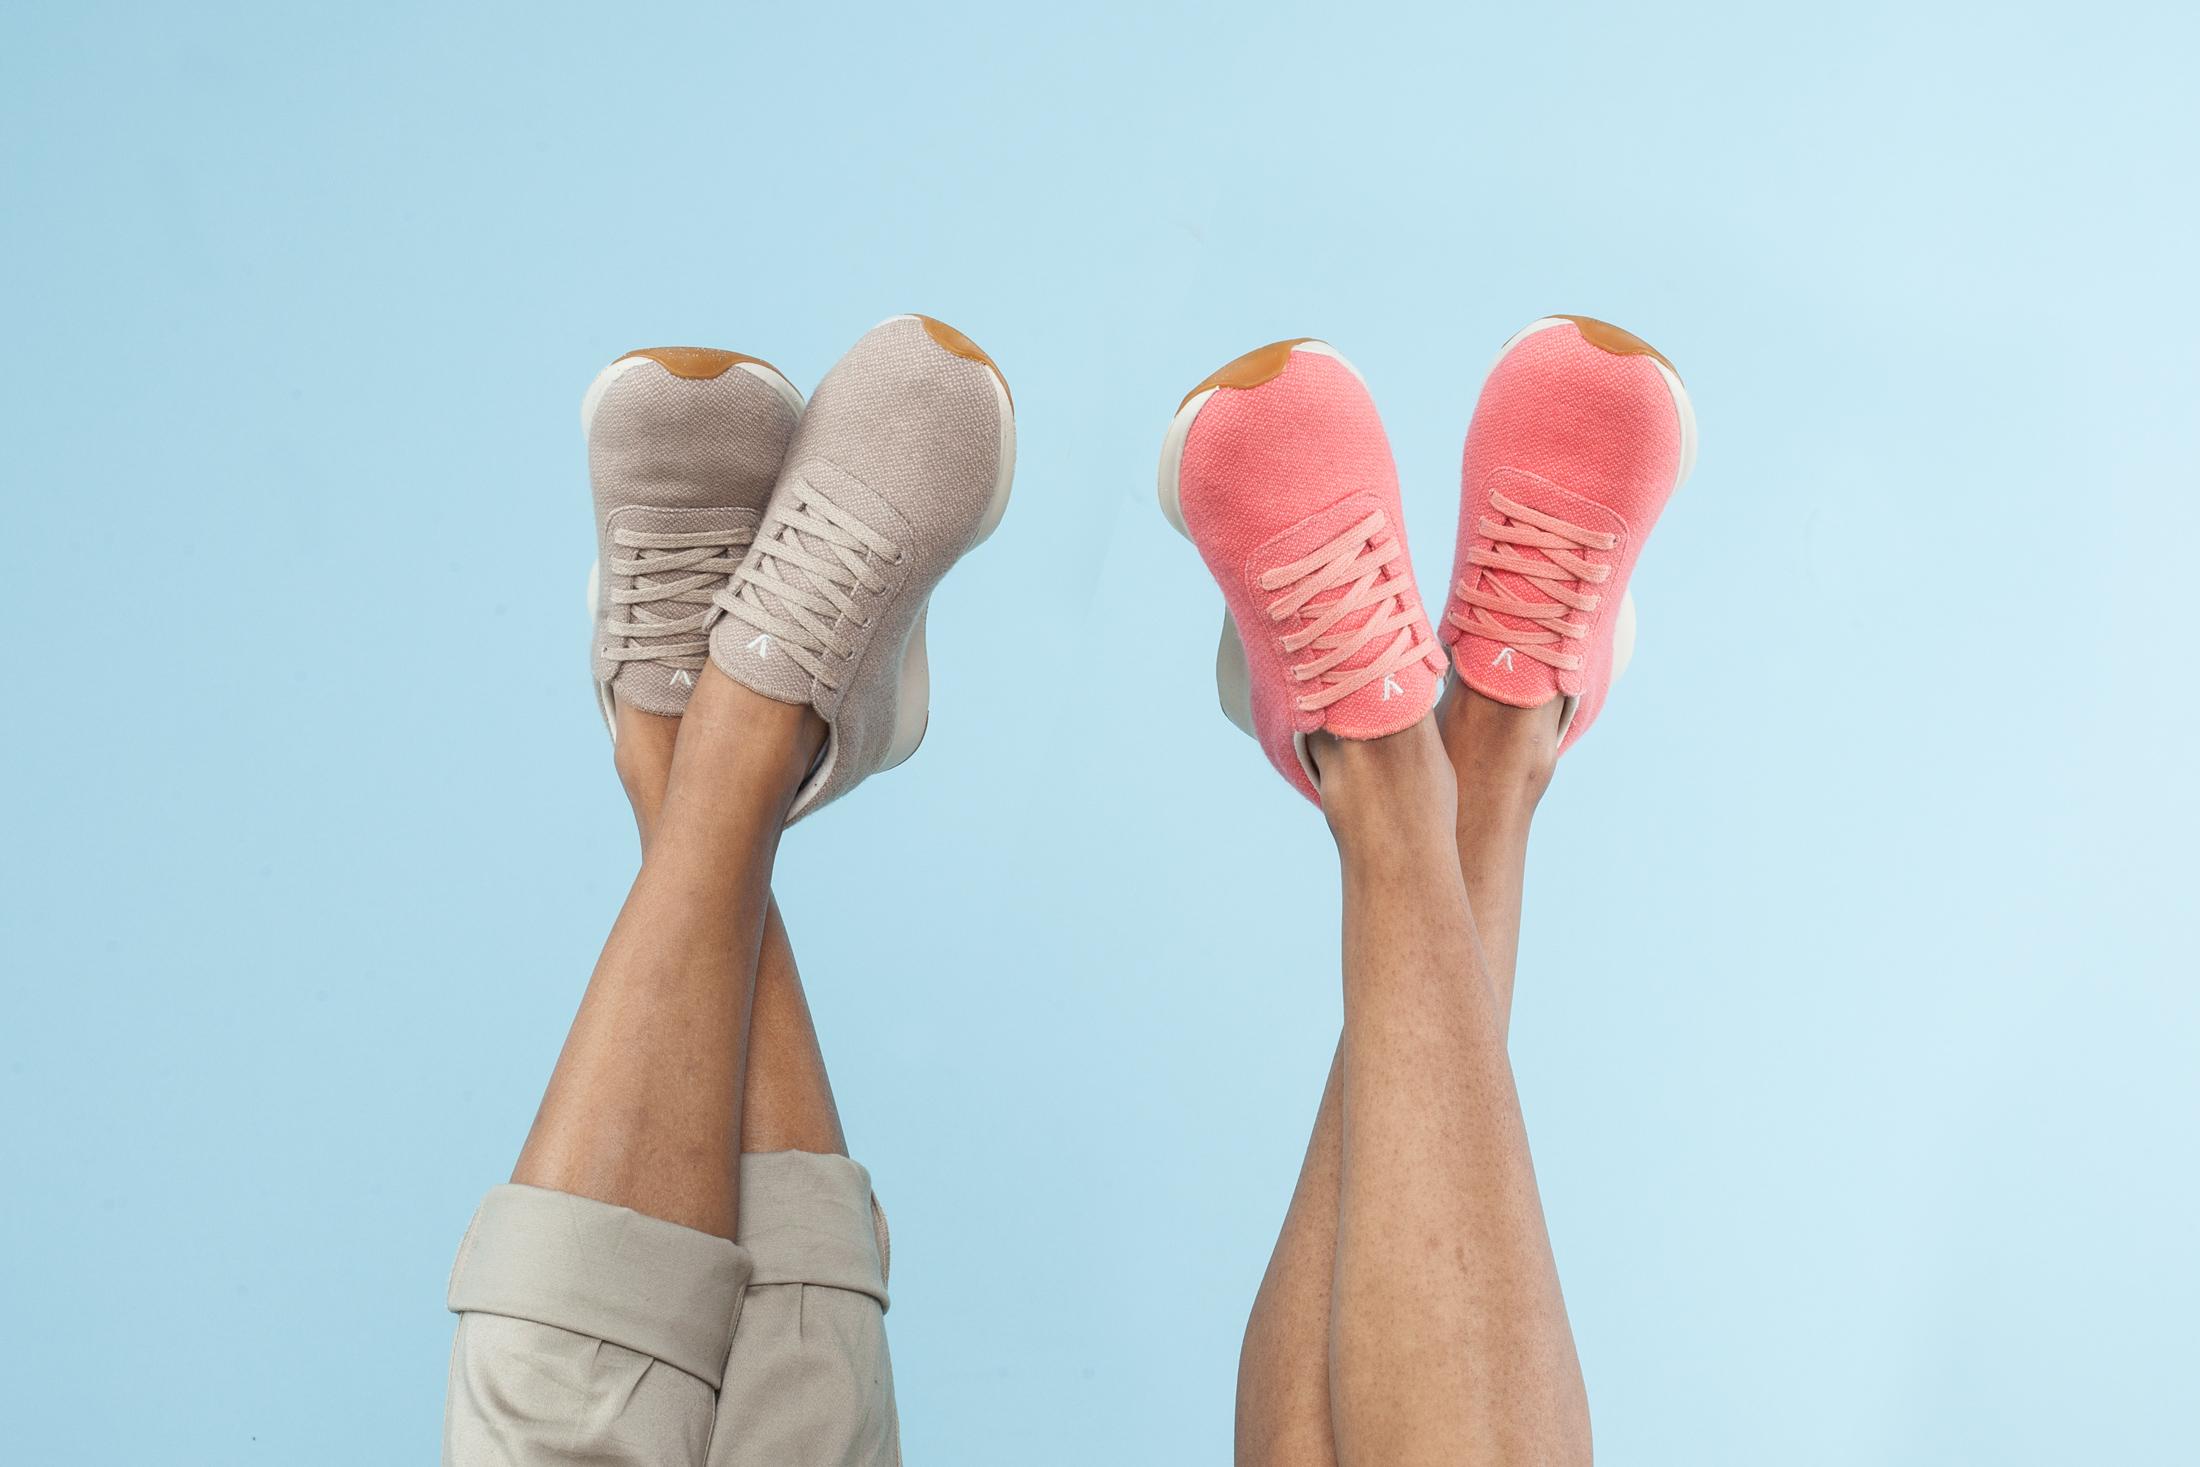 Yuccs, zapatillas de lana con lista de espera